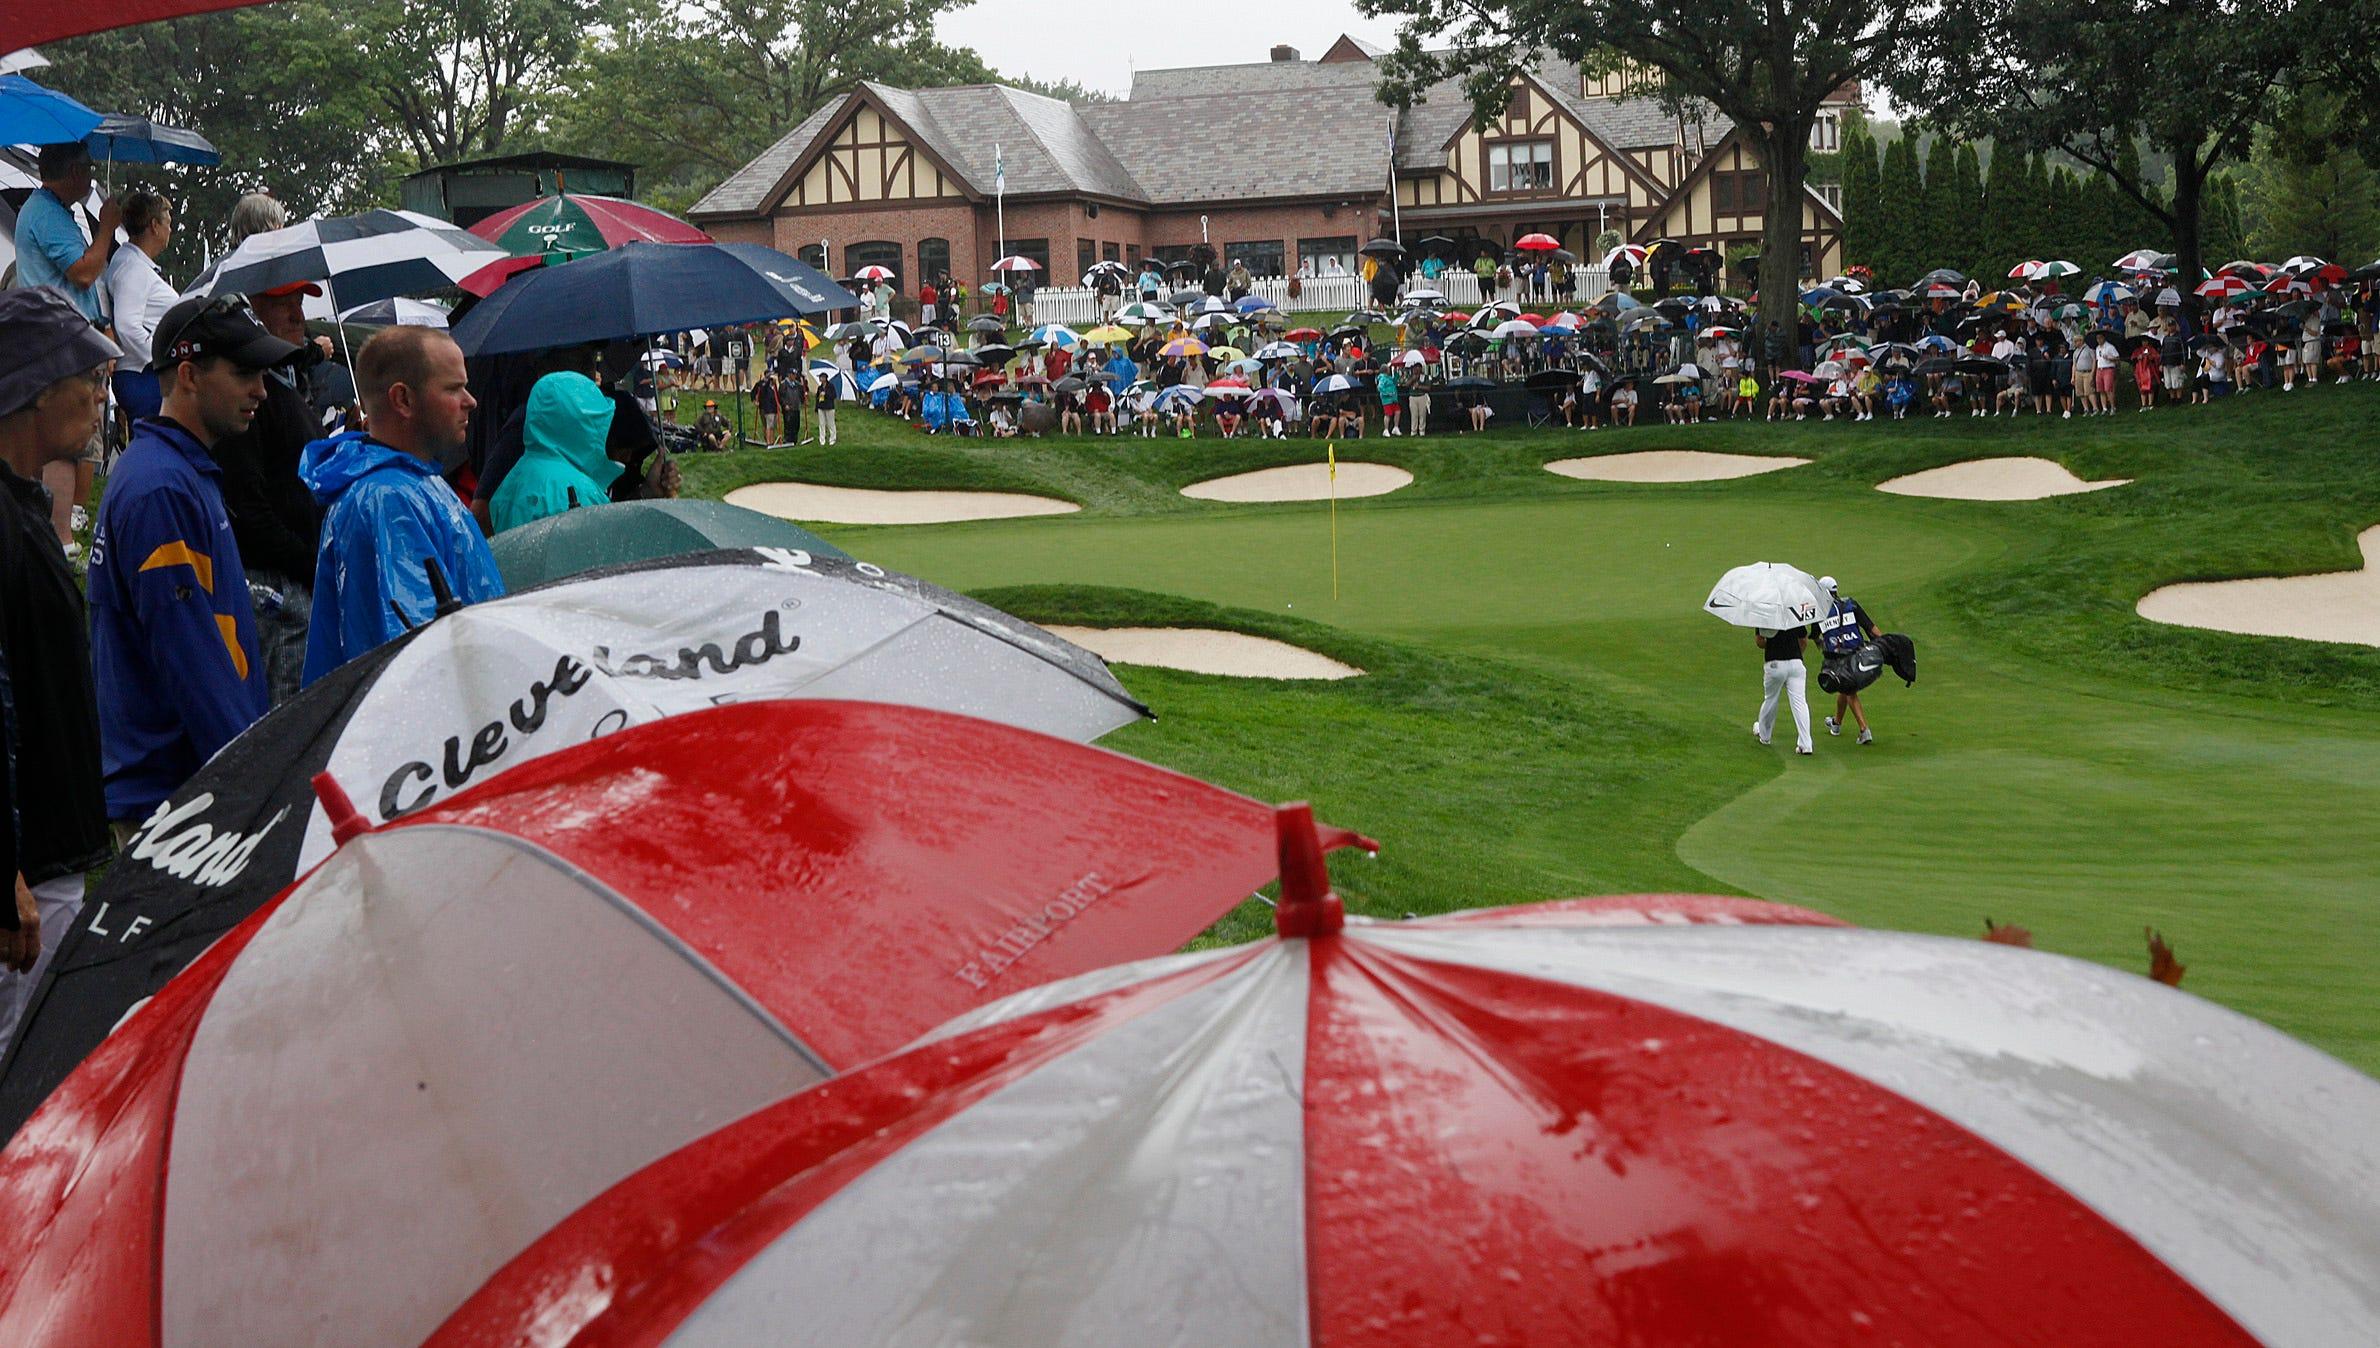 Umbrellas line the course at Oa Hill.